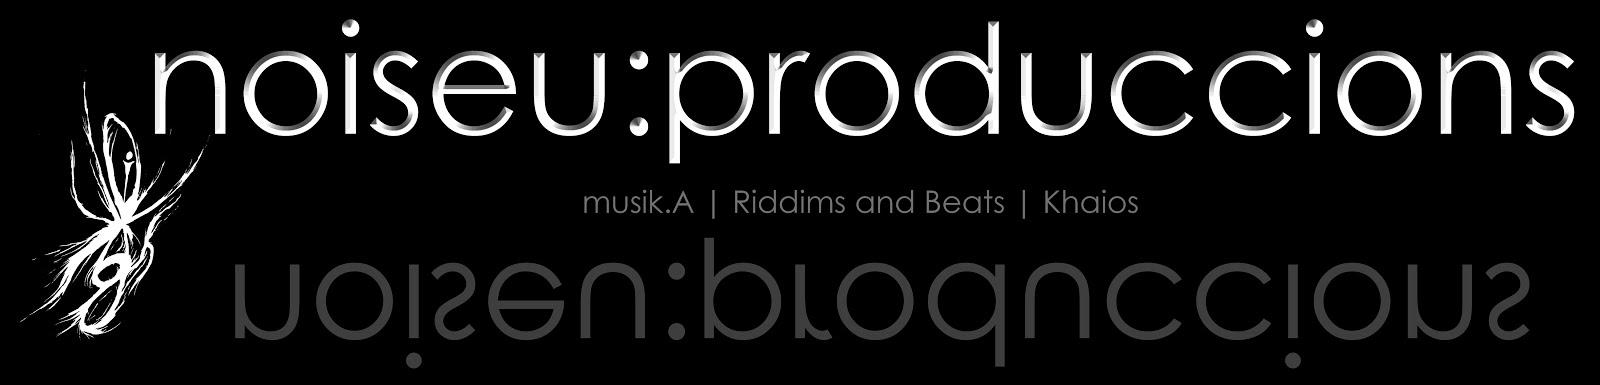 Noiseu Produccions | Noiseu.net | Music